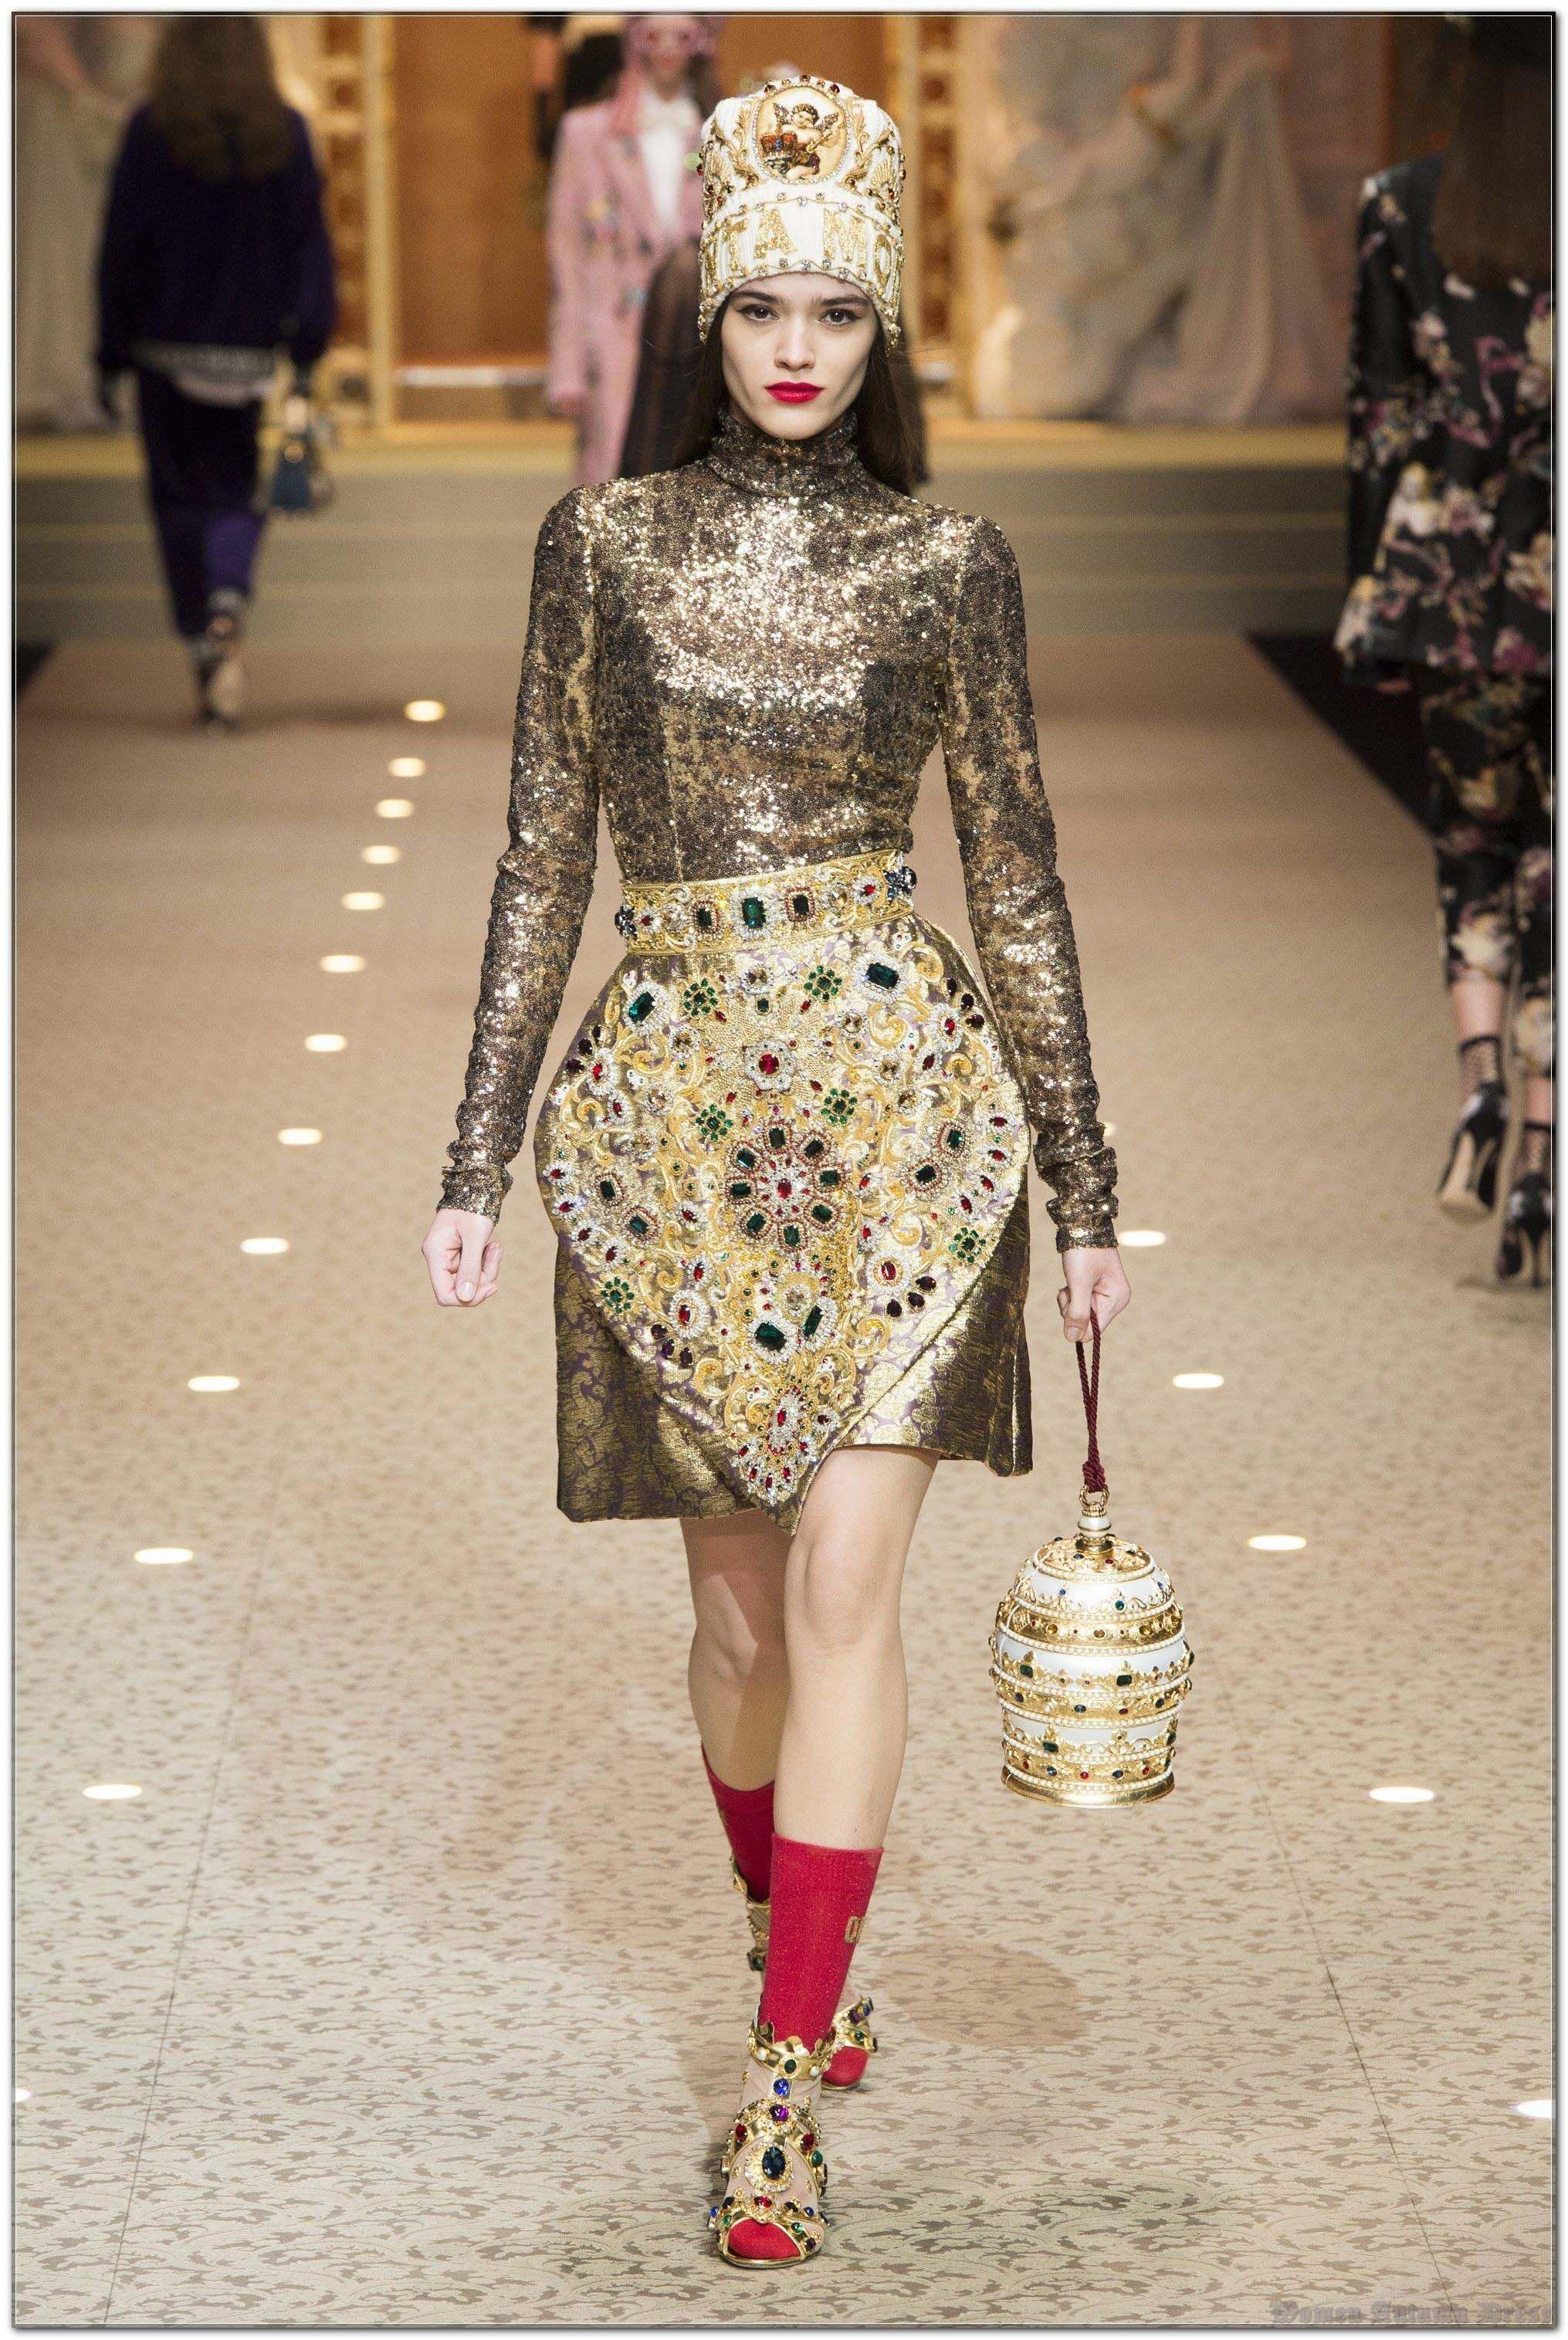 25 Best Things About Women Autumn Dress